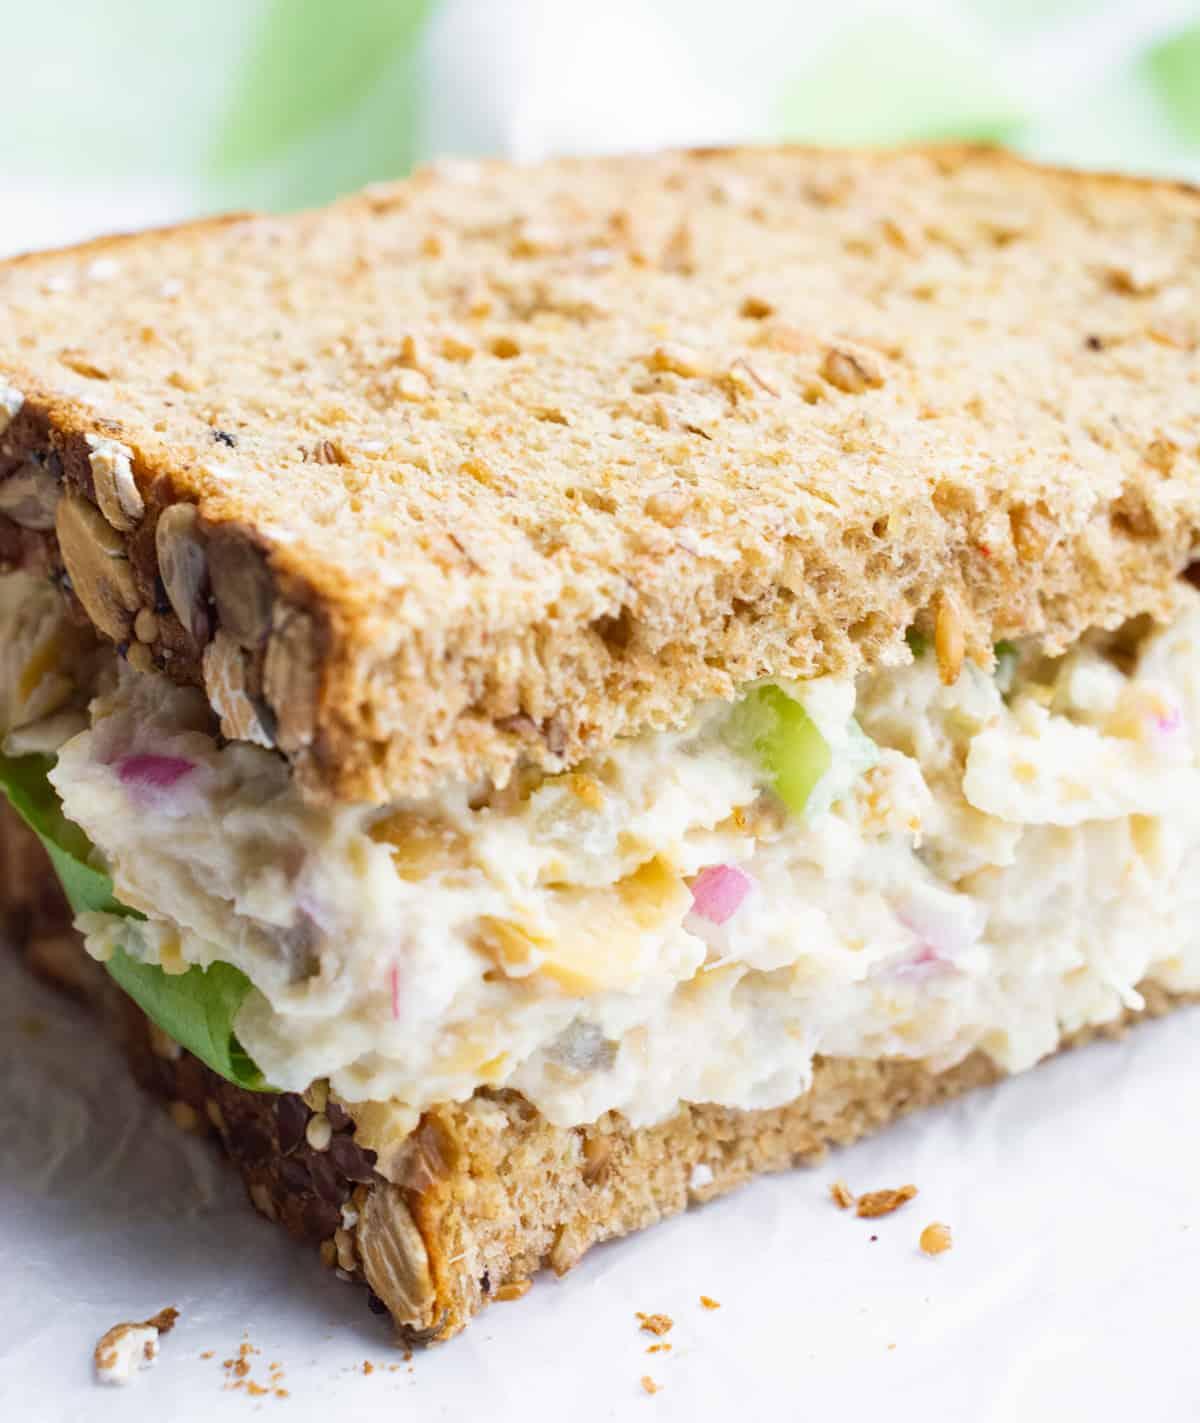 Half of a vegan sandwich.